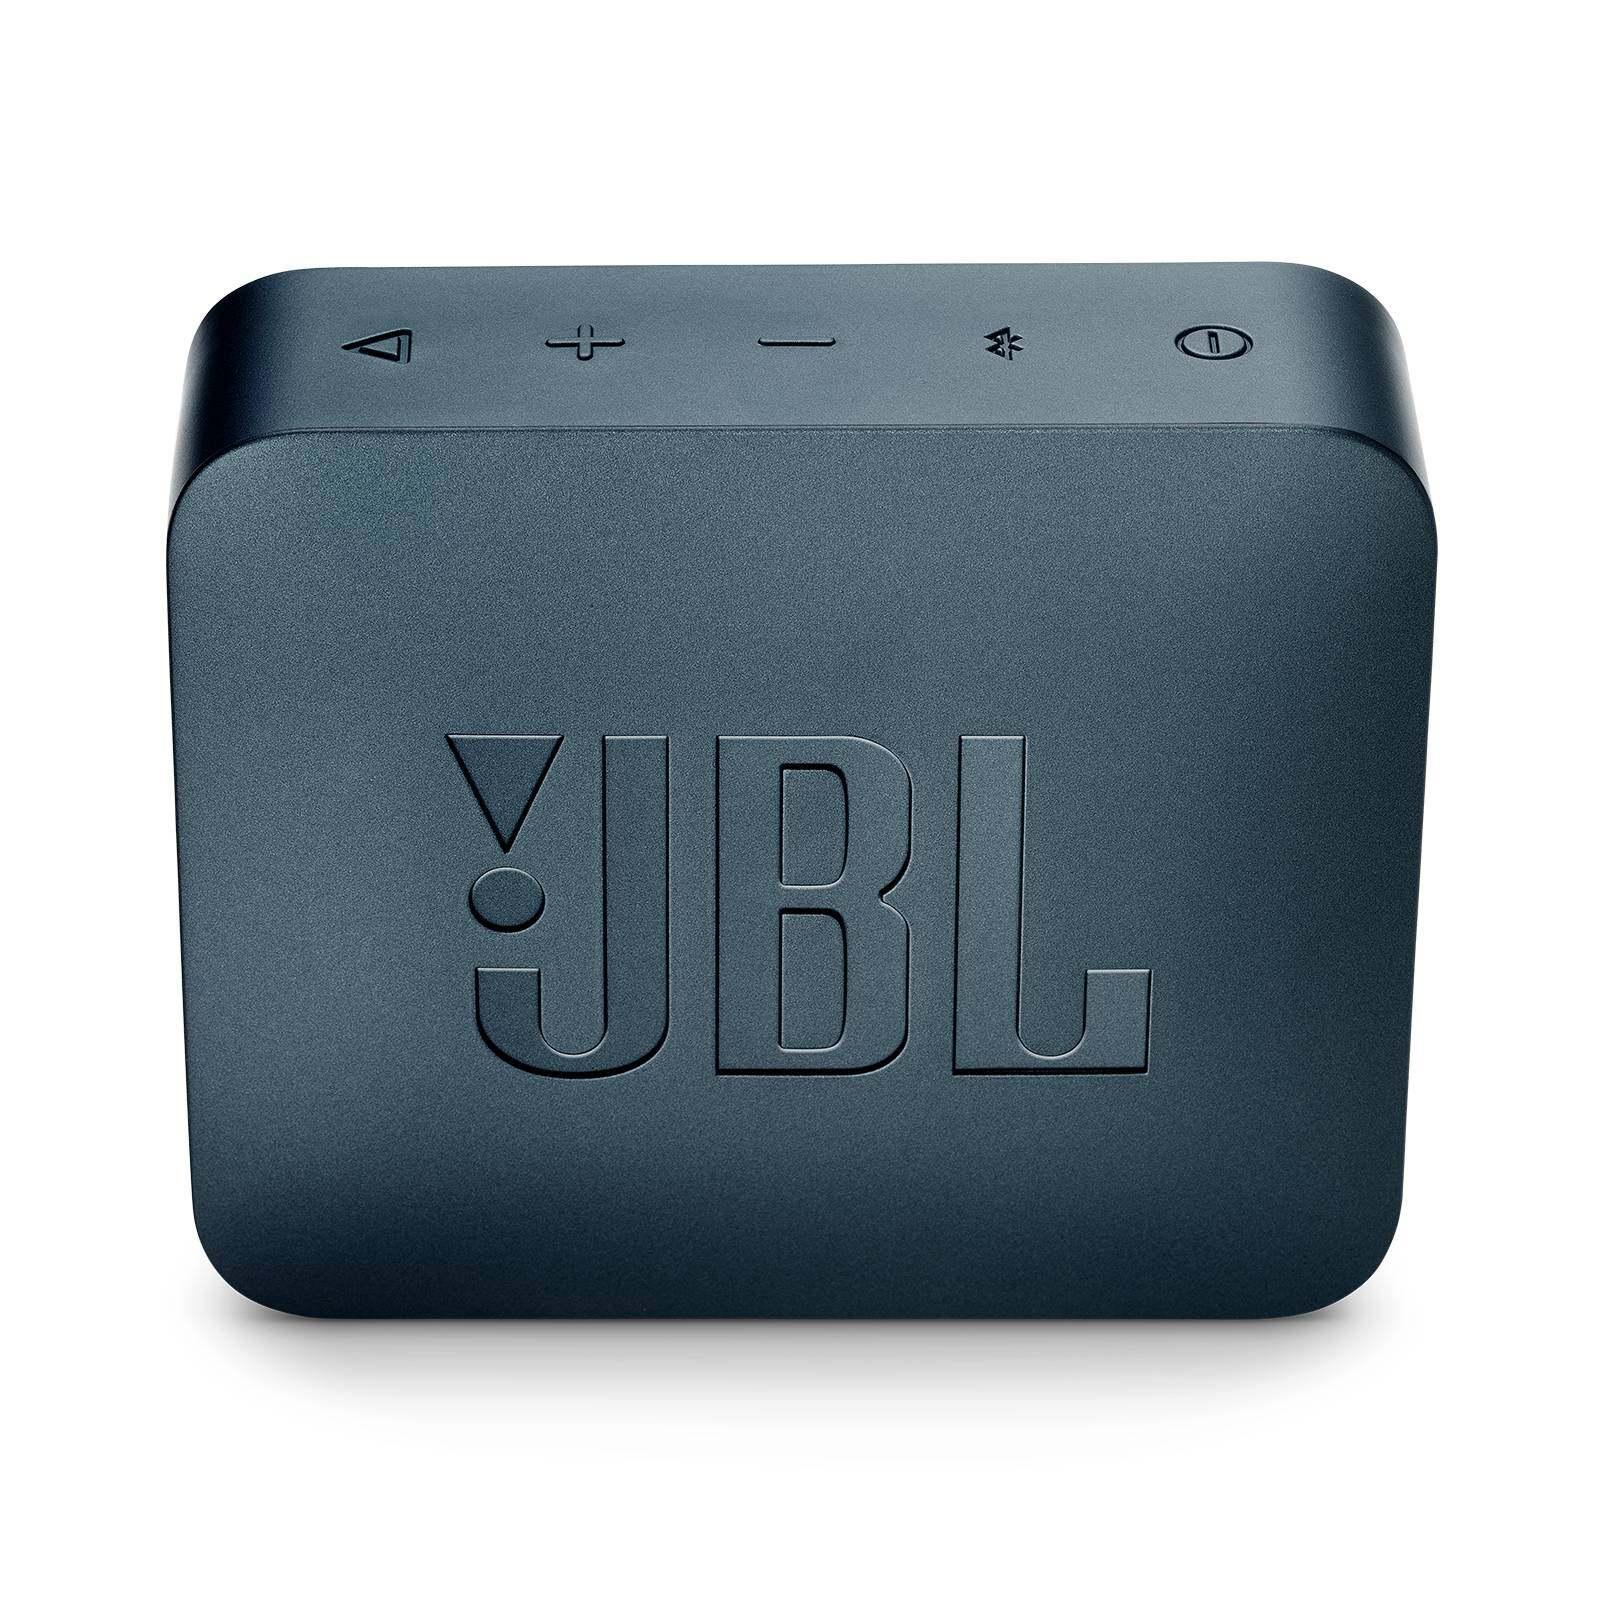 JBL GO 2 Portable Bluetooth Speaker with 5 Hours of Playtime, Waterproof